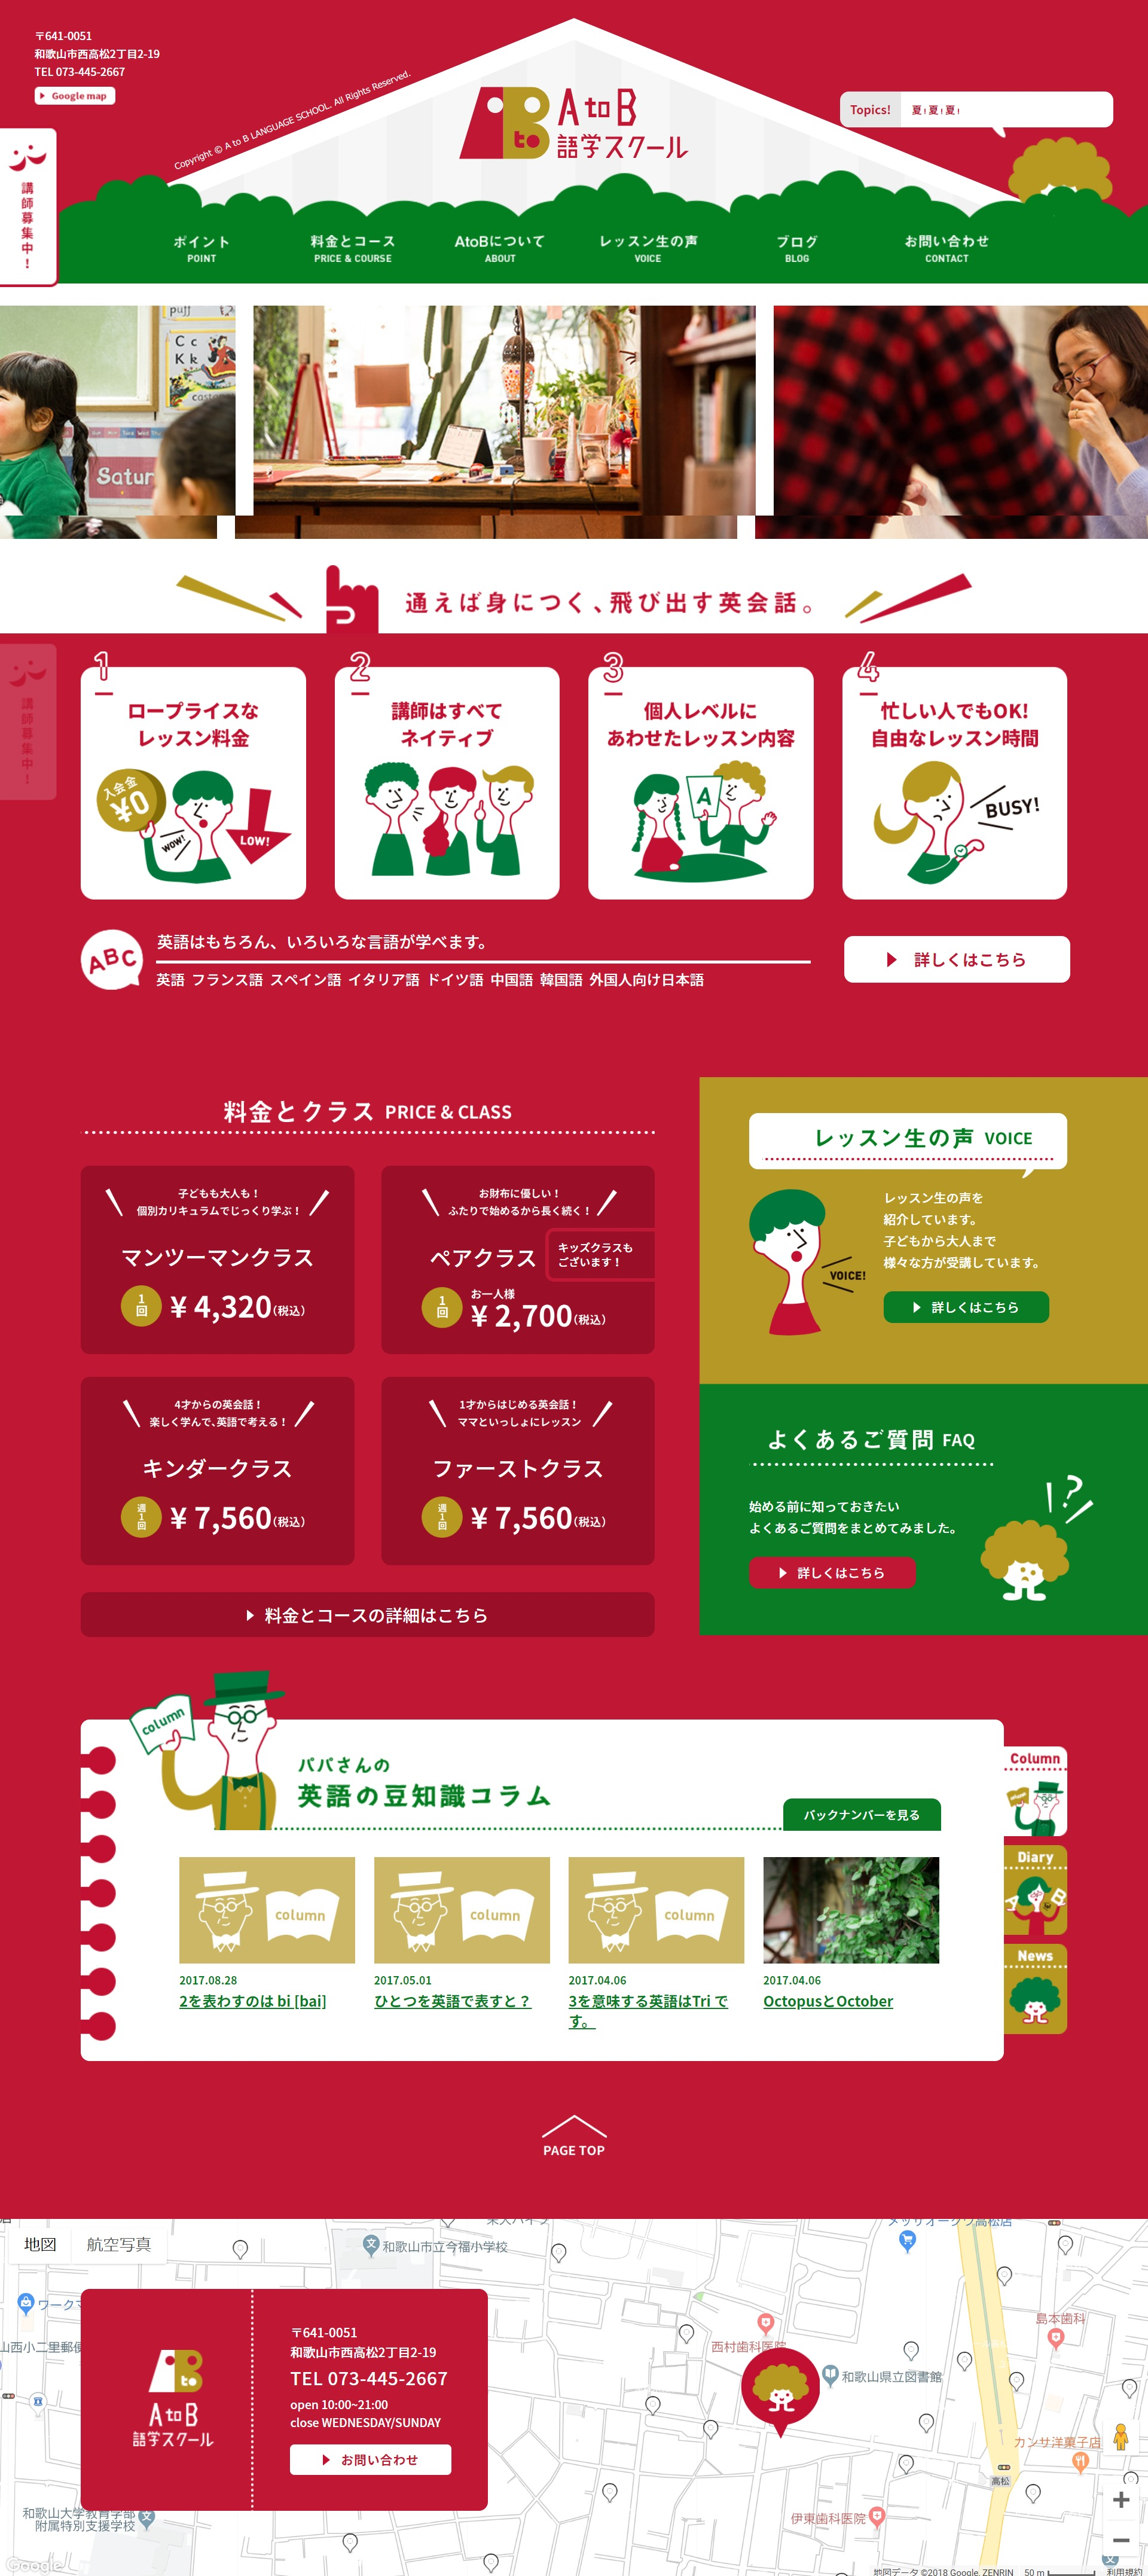 AtoB語学スクールPC版イメージ